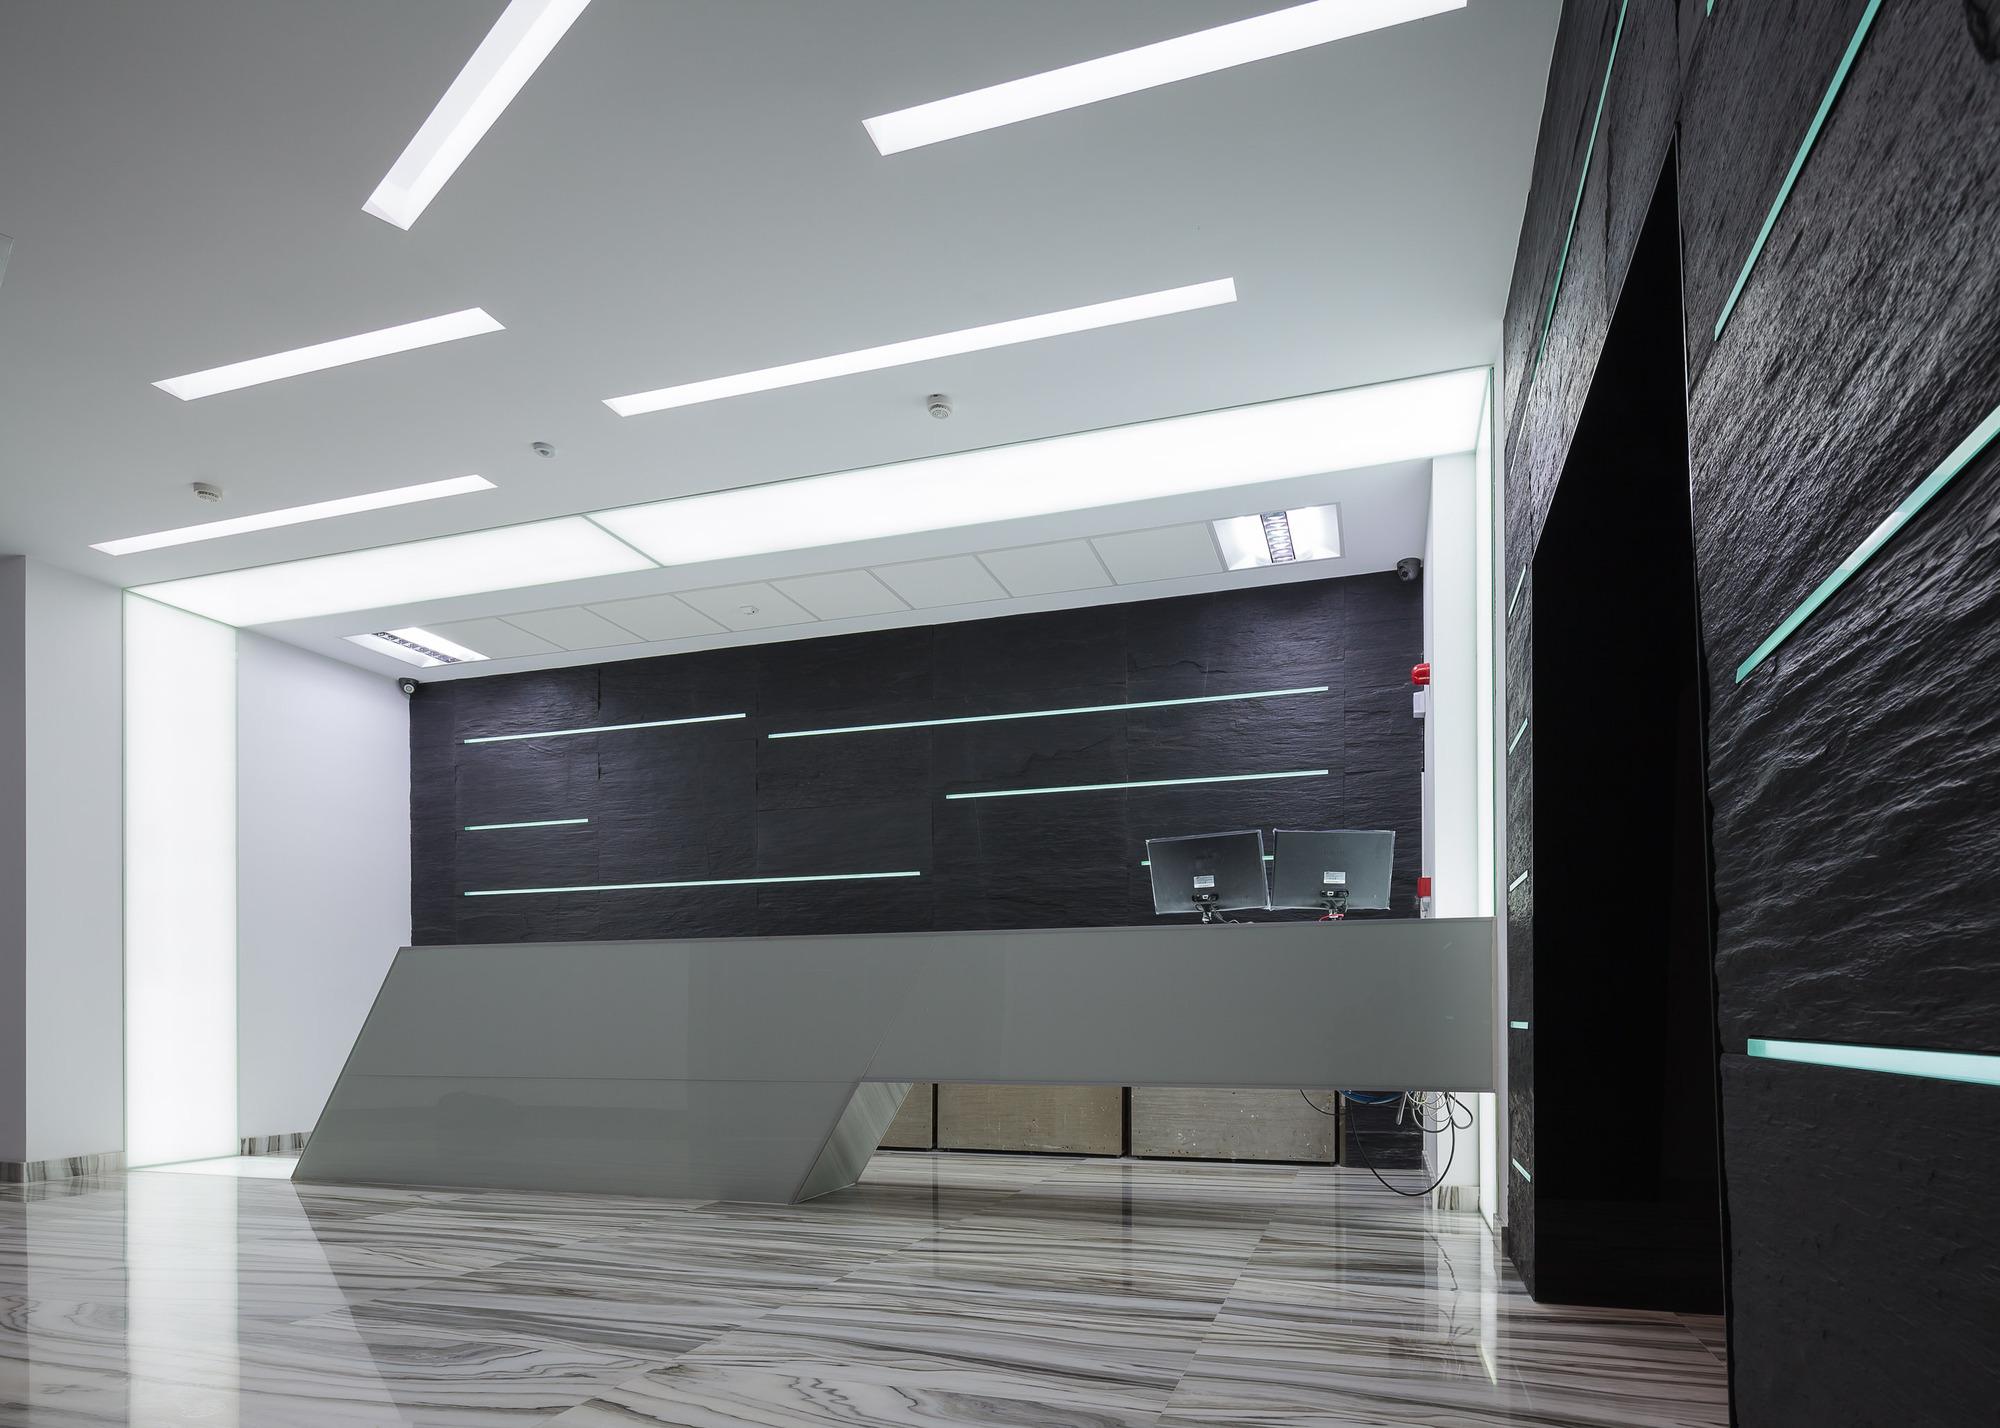 5111d49ab3fc4ba002000021_monolit-office-building-igloo-architecture_cdragomir_monolit_015